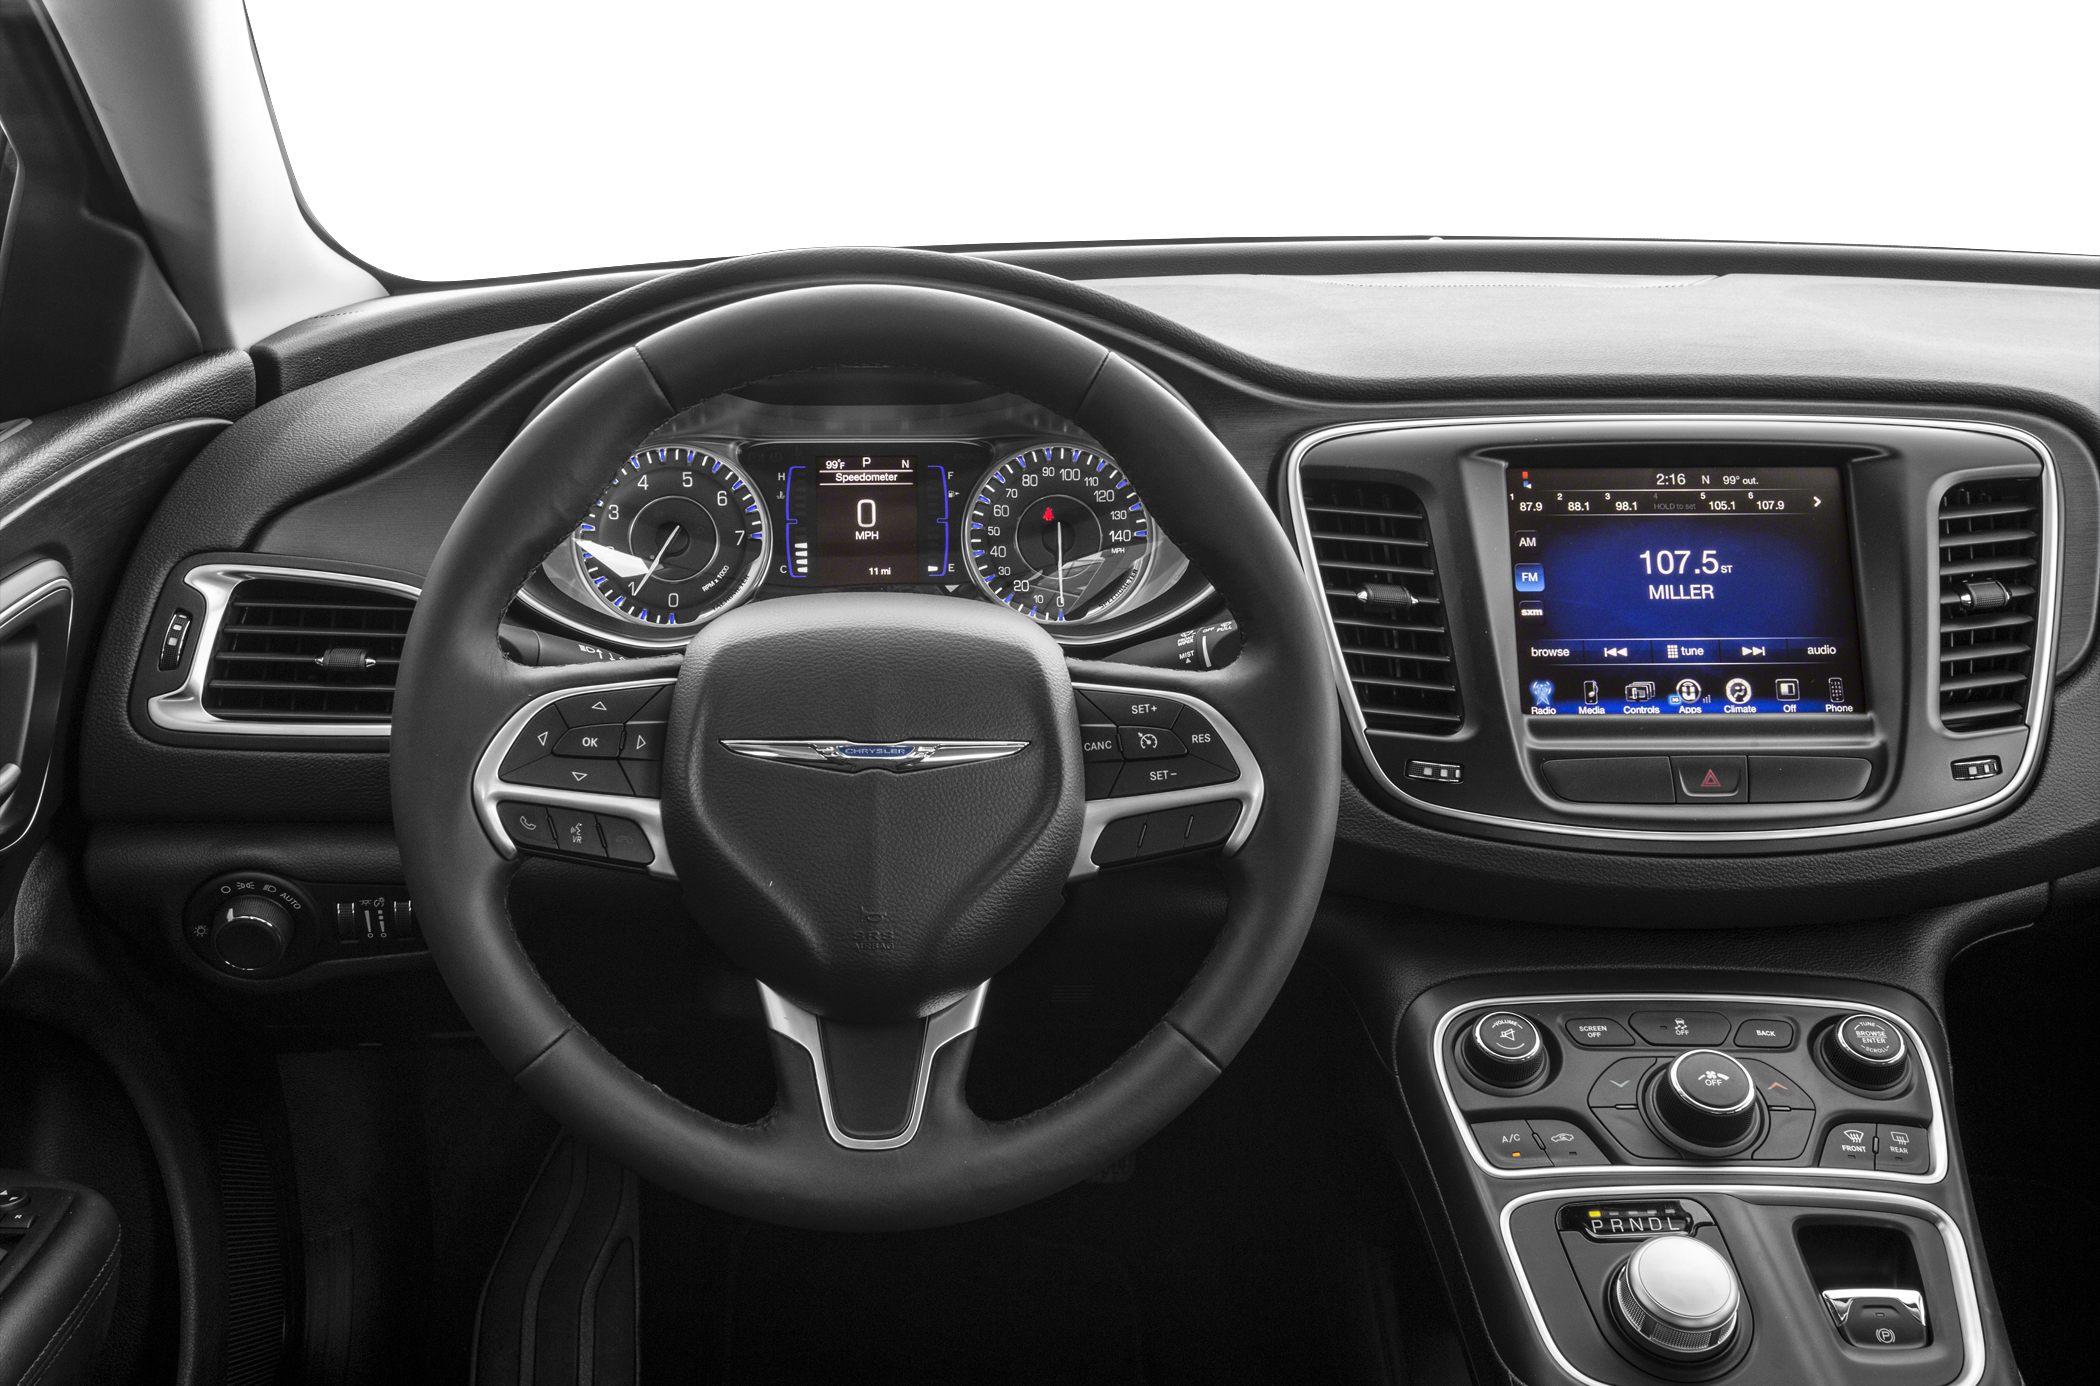 2016 Chrysler 200 4d Sedan Limited I4 - Premier Auto ...